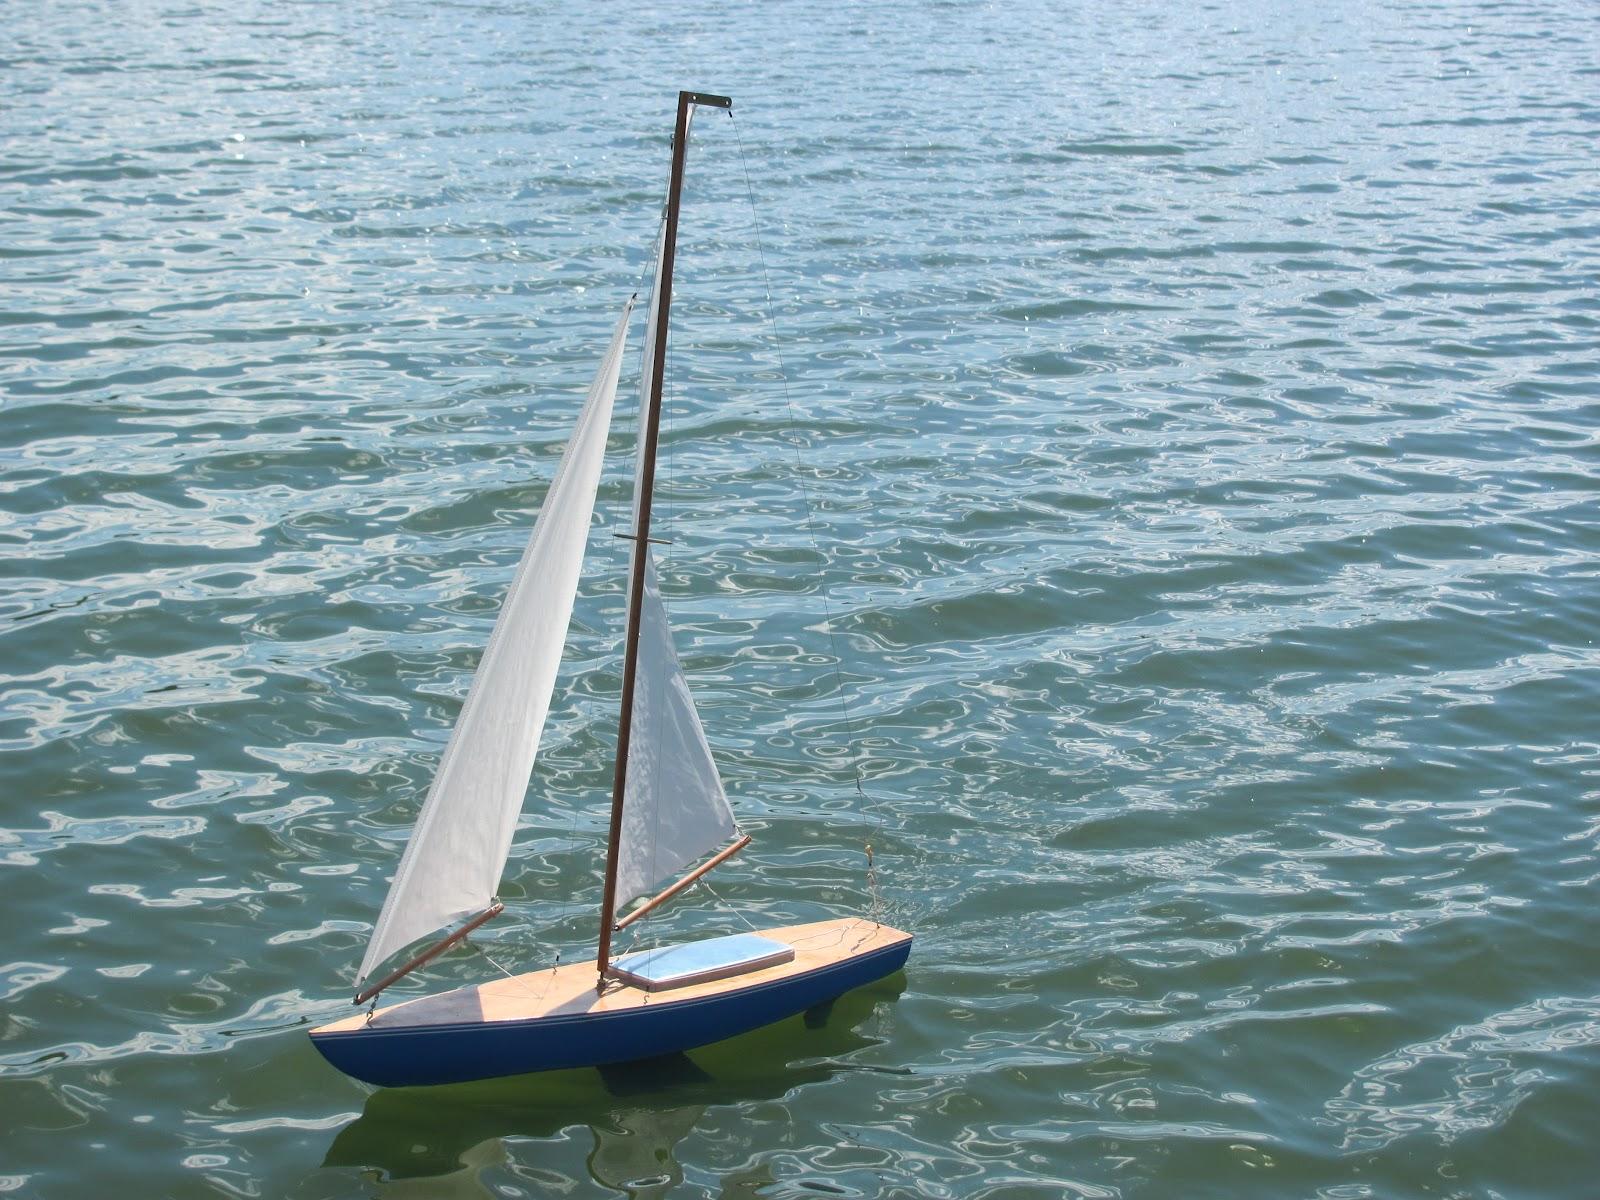 Rooms: Kayaking The Lakes Of South Dakota: Kayaks And Sailing The